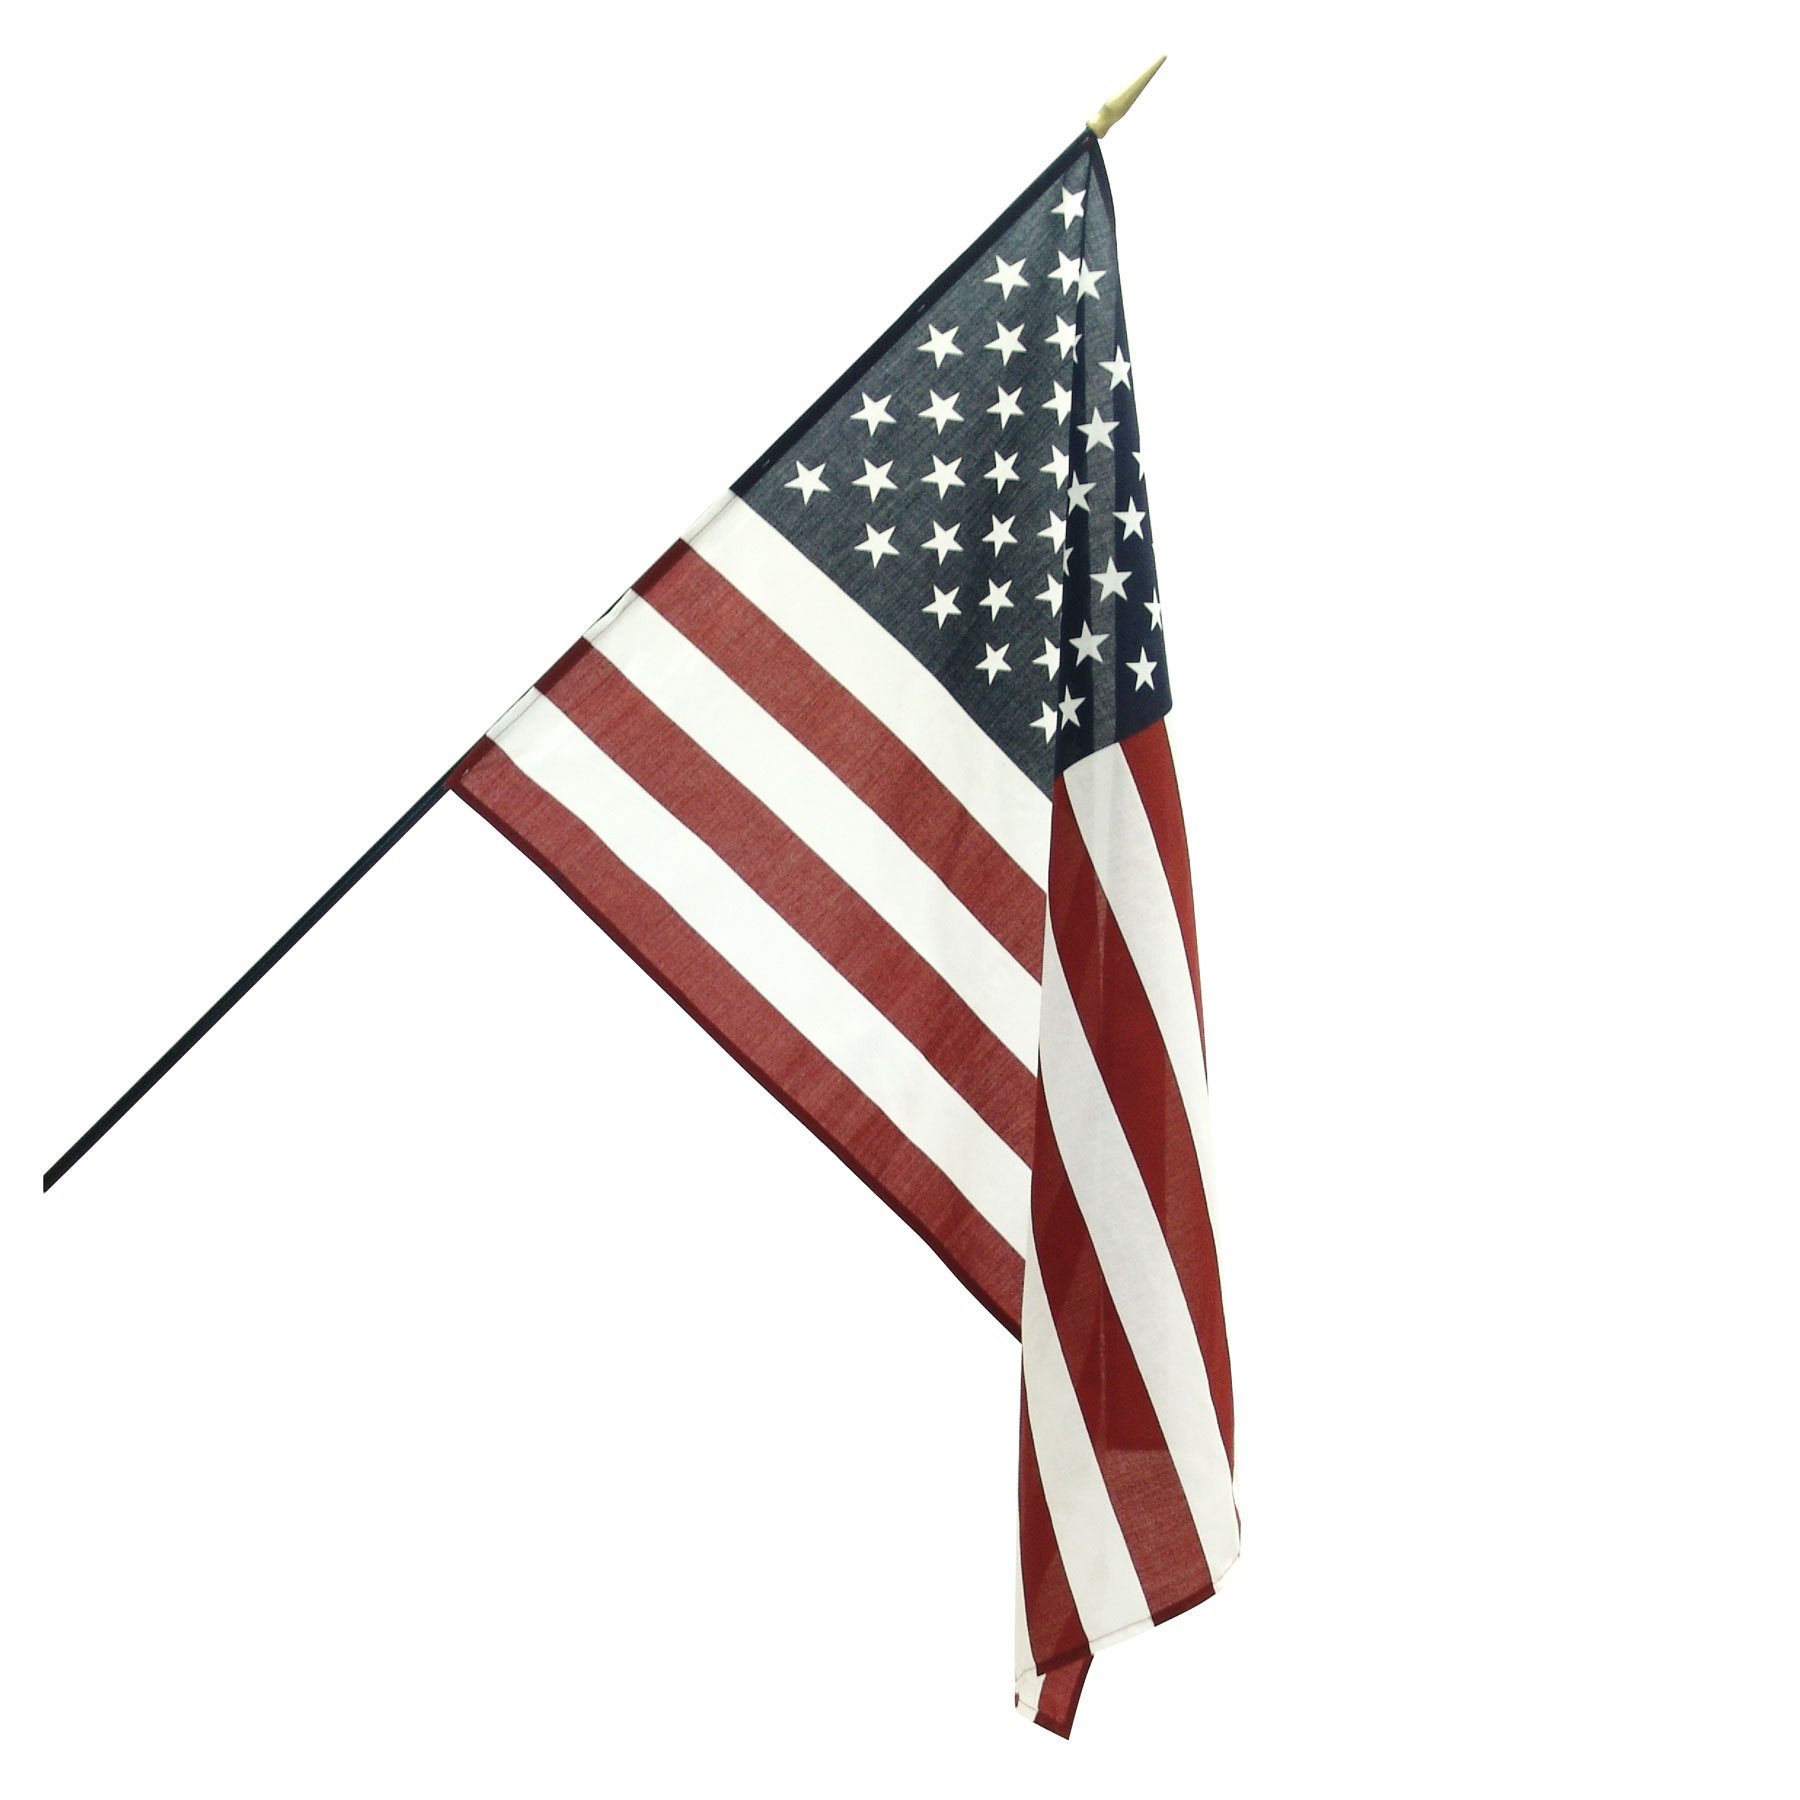 1800x1800 Classroom American Flag 2ft X 3ft For Schools